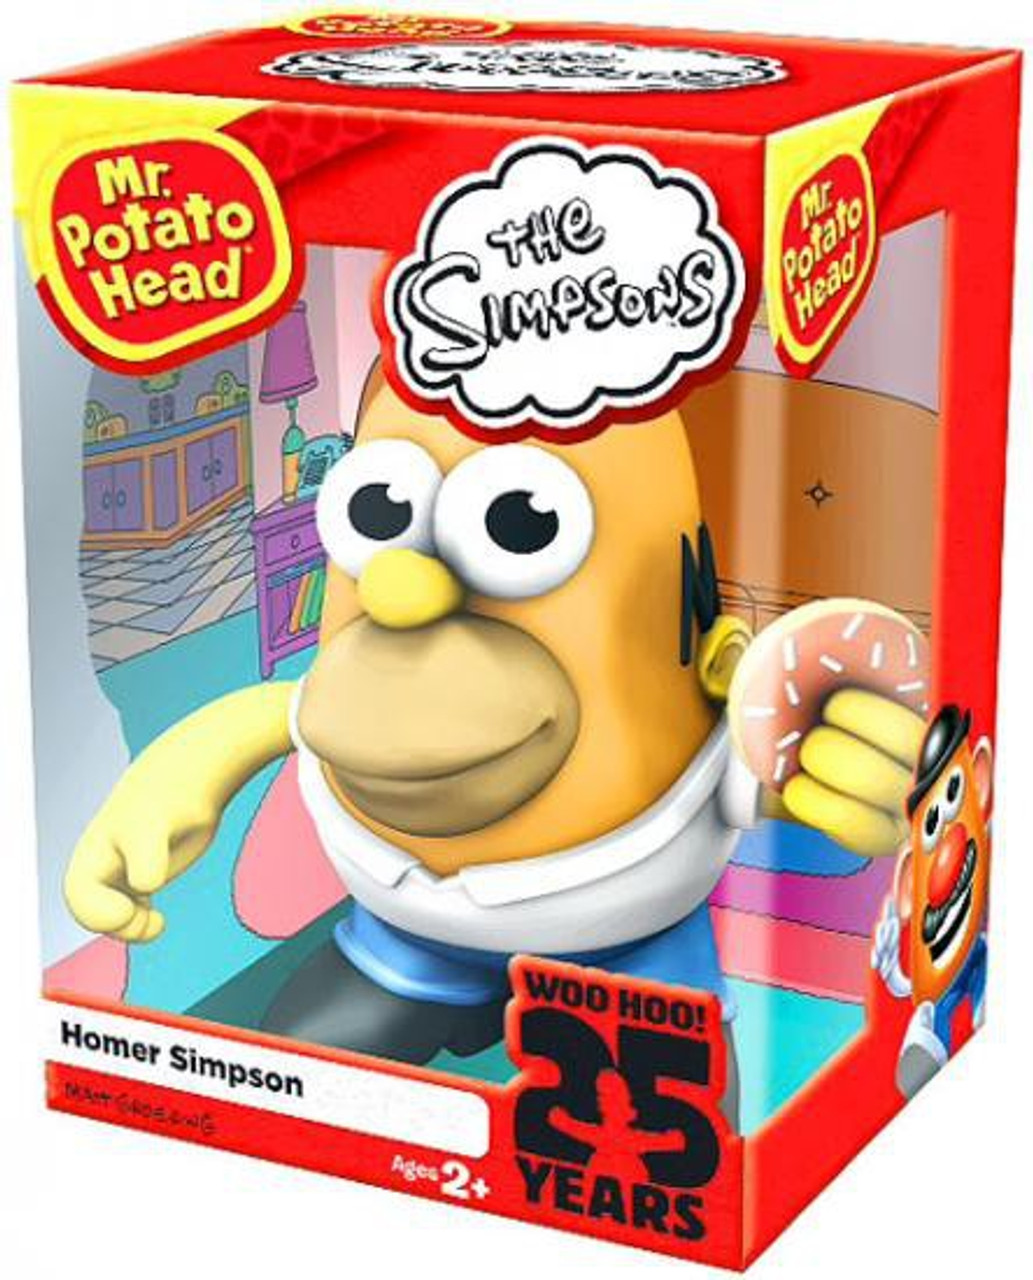 The Simpsons Homer Simpson Mr. Potato Head